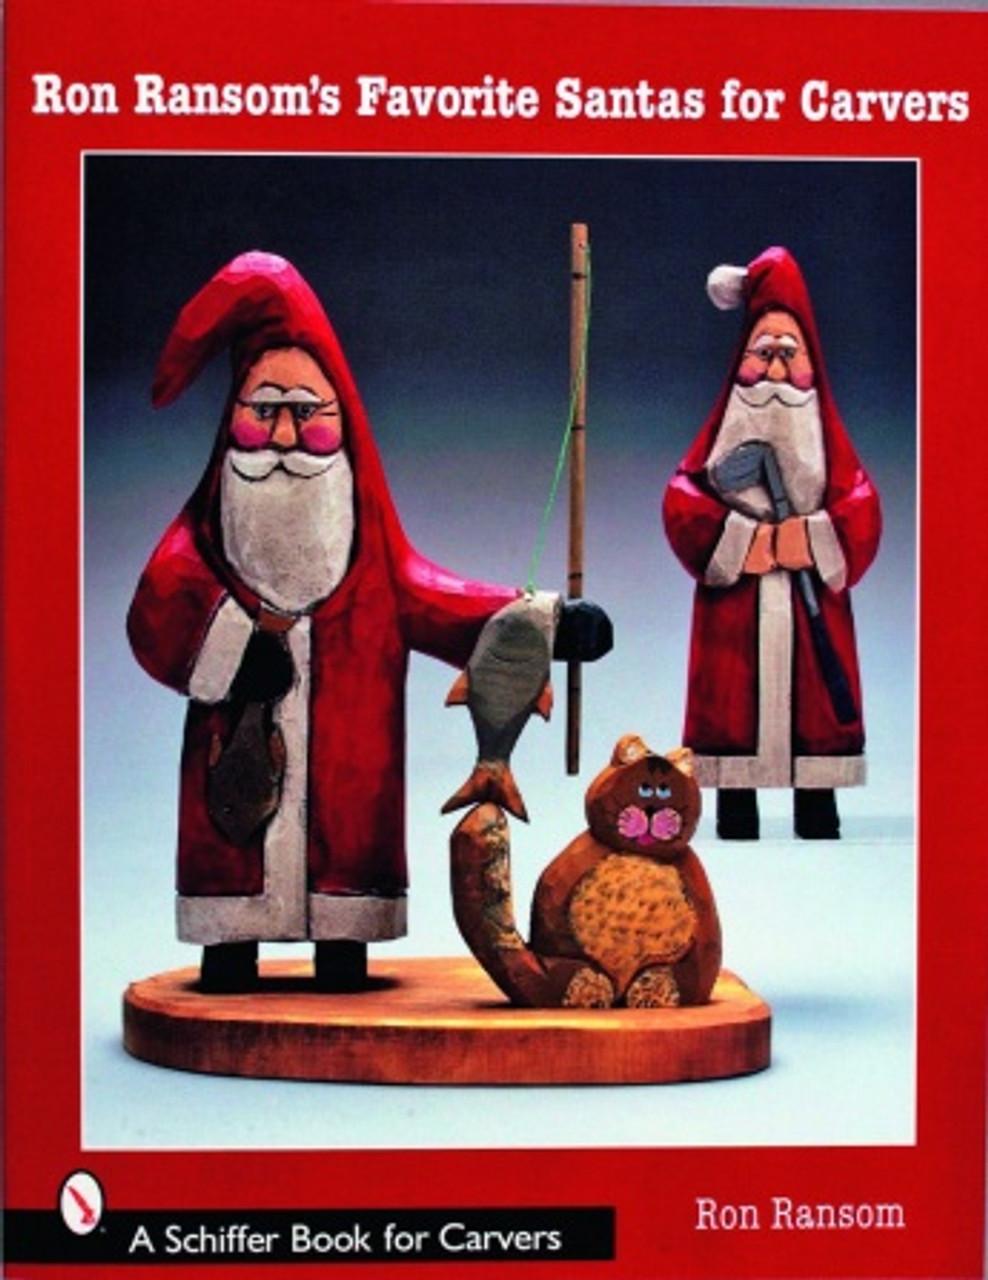 Ron Ransom's Favorite Santas for Carvers